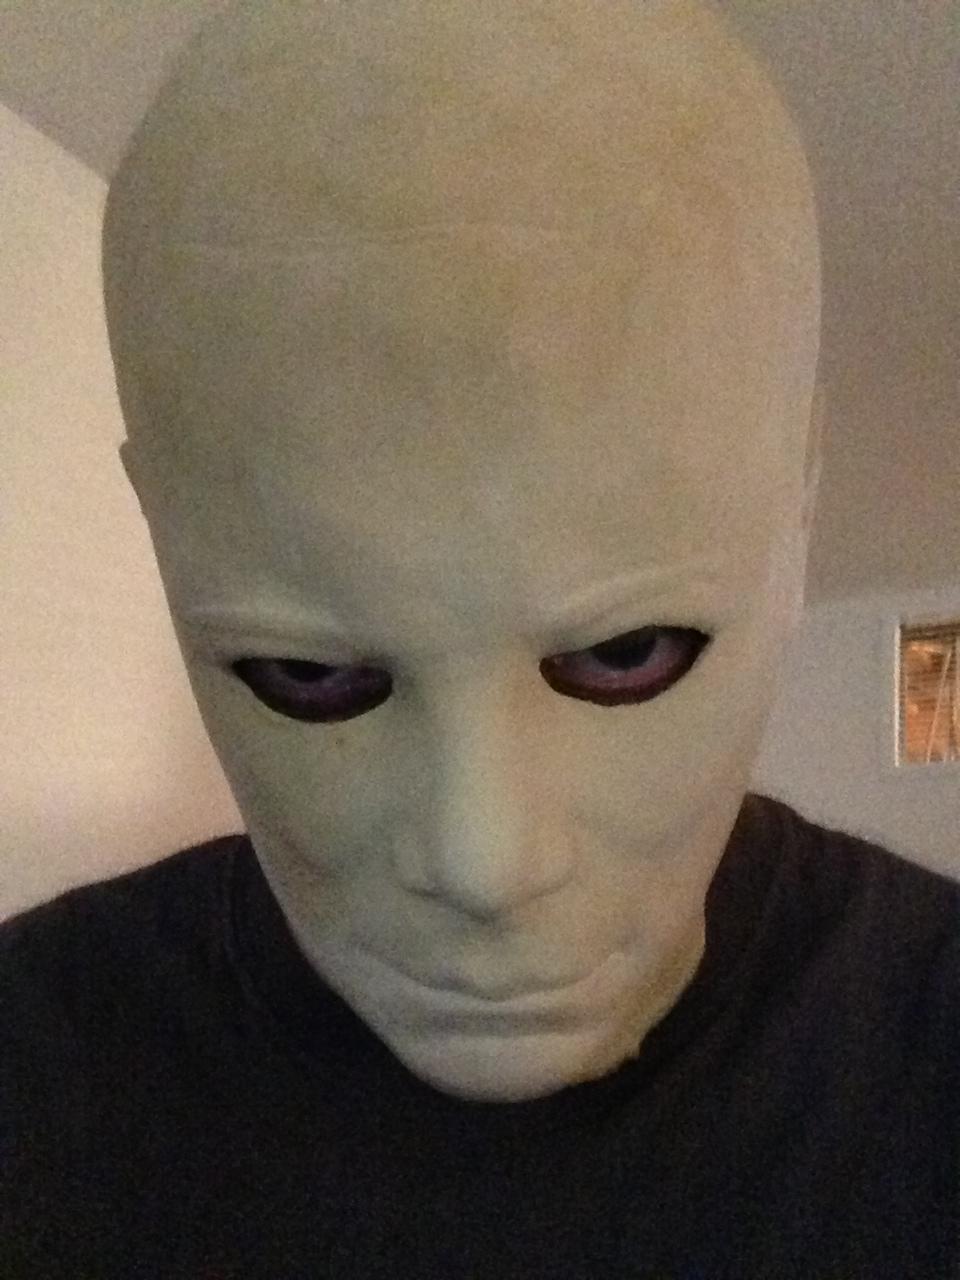 Captain kirk mask painted white